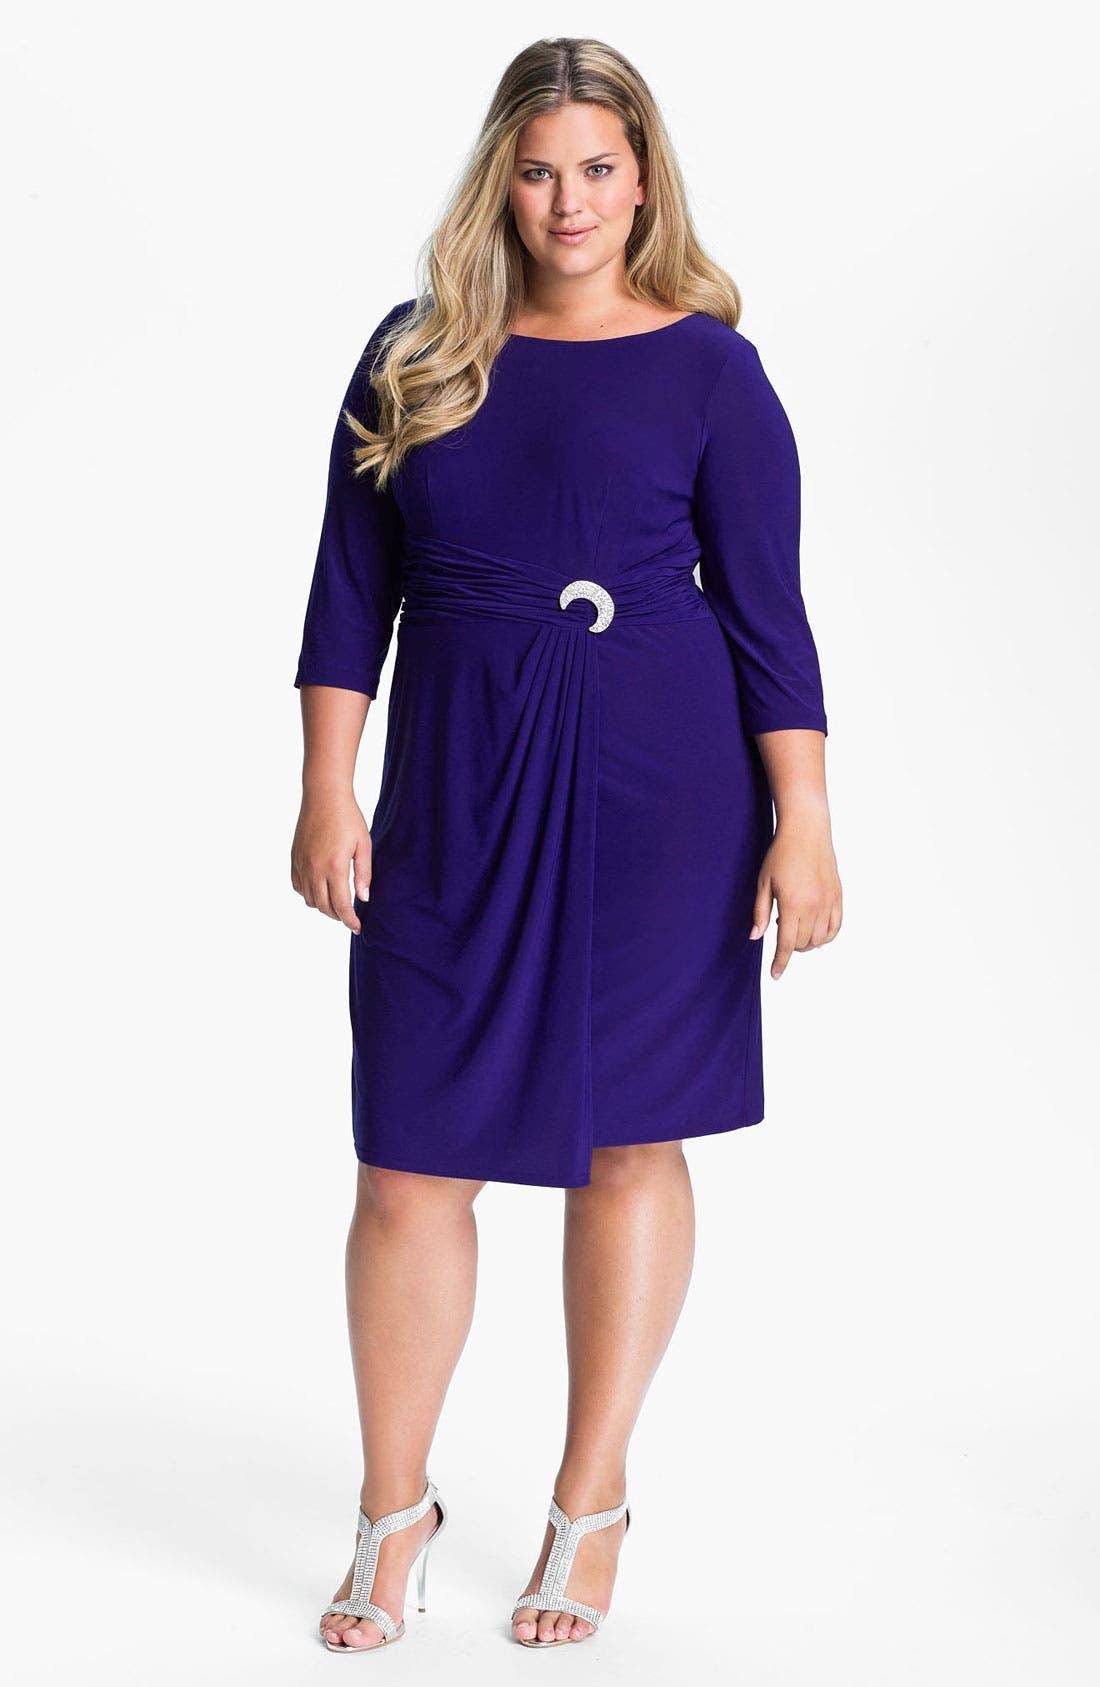 Alternate Image 1 Selected - Alex Evenings Jeweled Matte Jersey Dress (Plus)